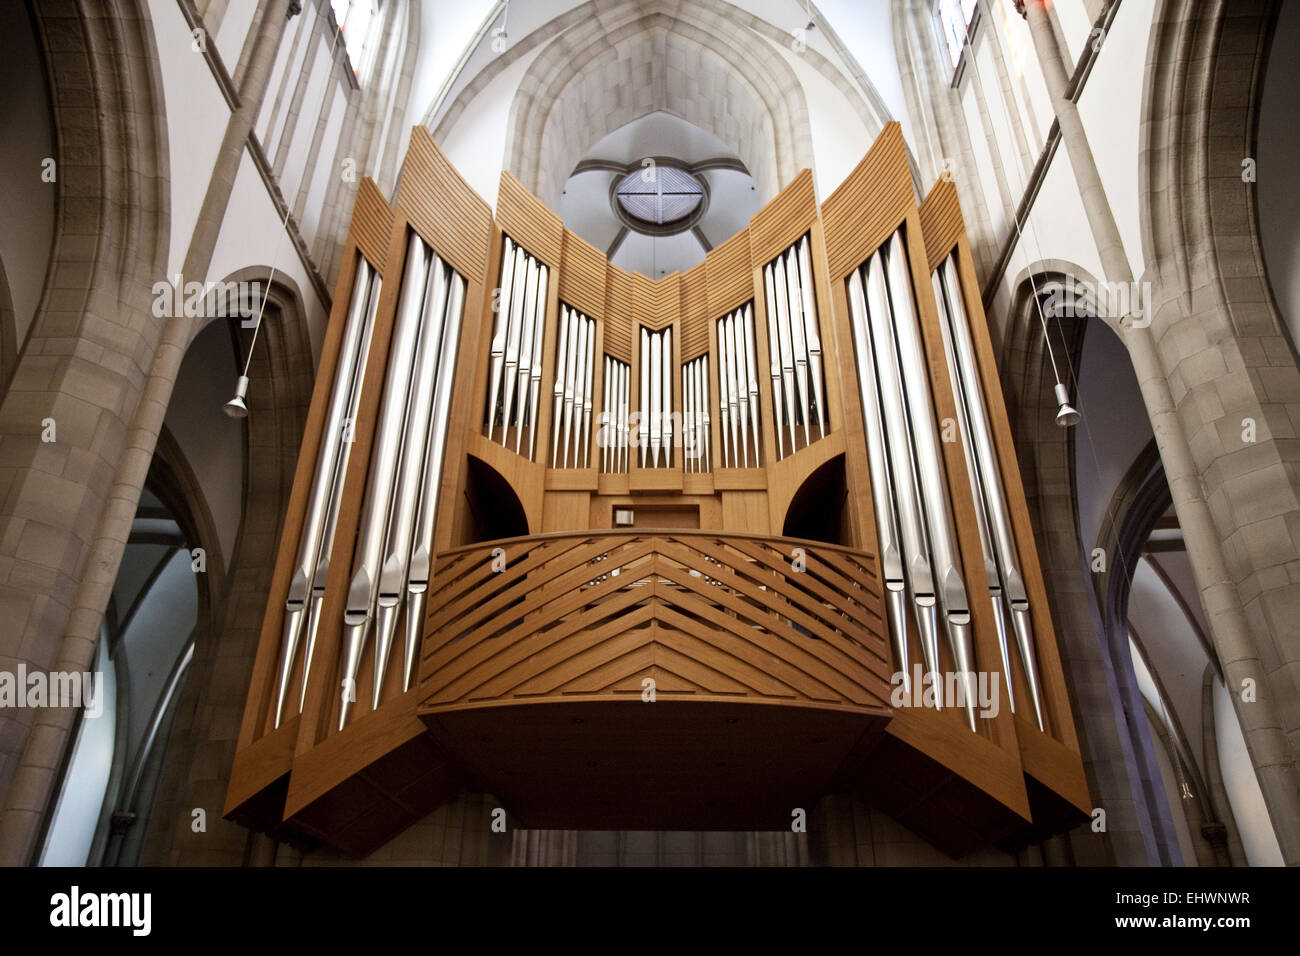 Órgano, Salvator Iglesia en Duisburgo, Alemania. Imagen De Stock